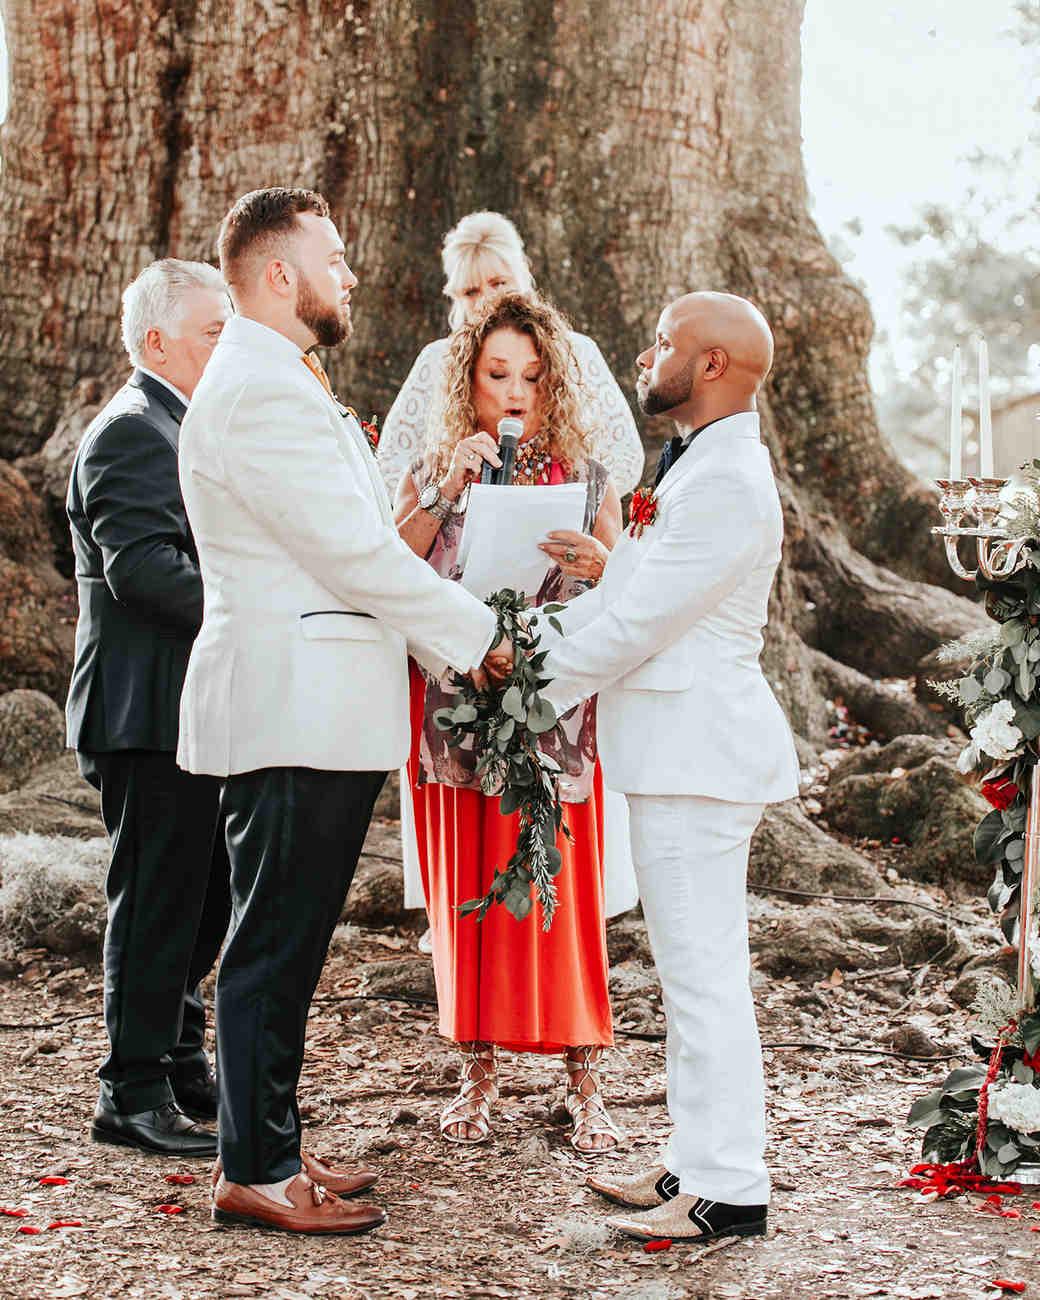 joe-tim-wedding-ceremony-406-1018_vert.jpg